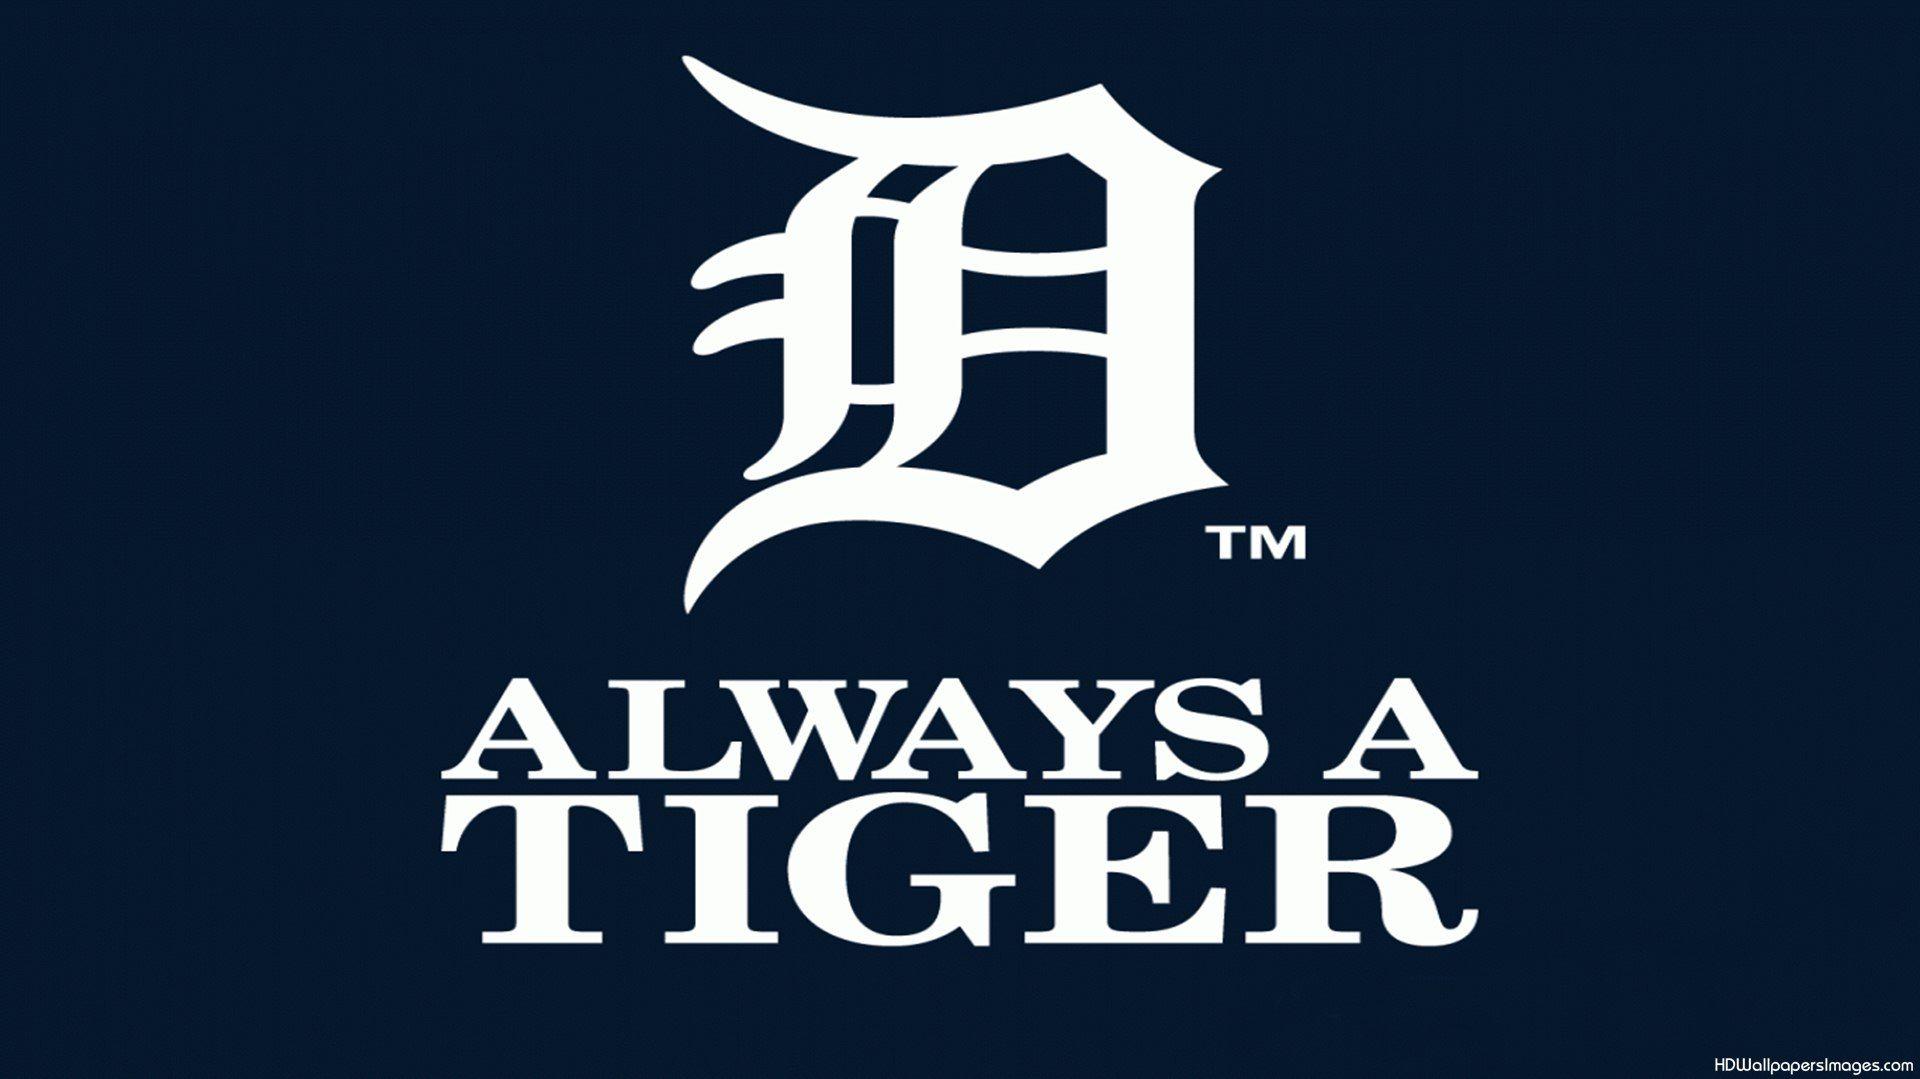 Sports Detroit Tigers Logo Hd Wallpapers Images Detroit Tigers Wallpaper Detroit Tigers Baseball Detroit Tigers Tigers Baseball